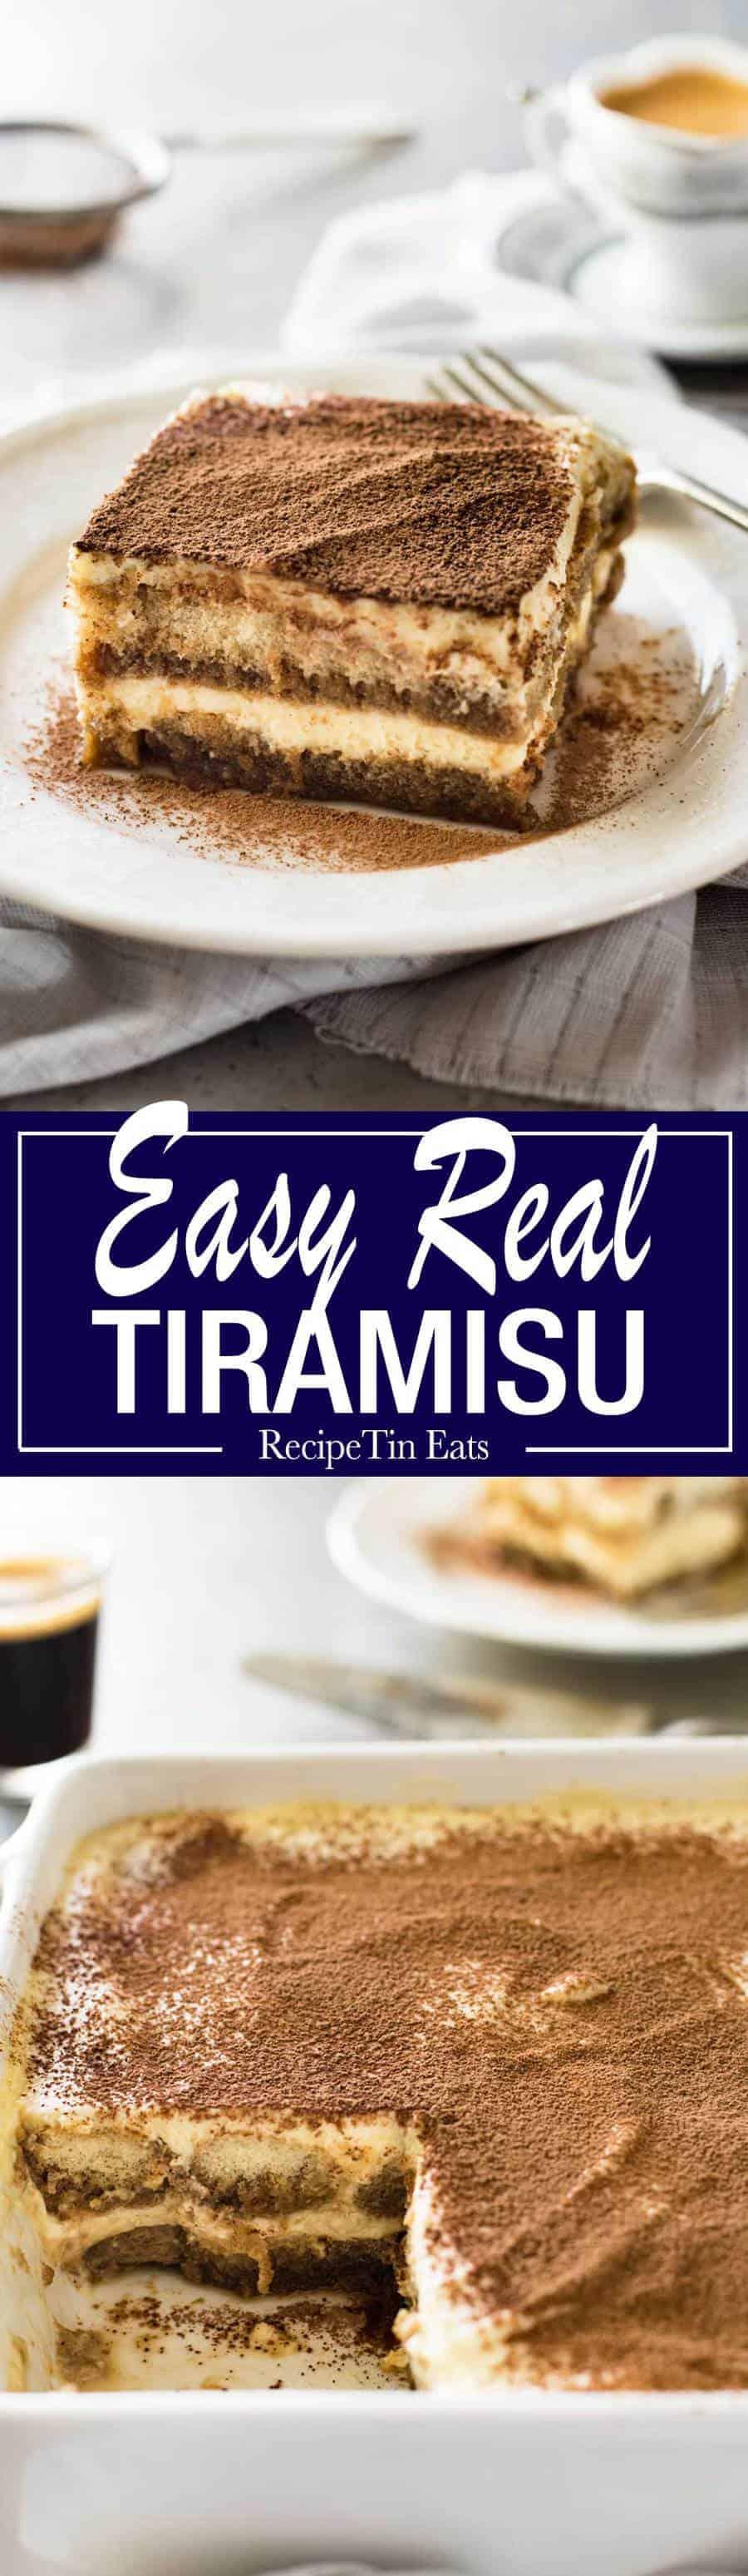 I love this recipe, it's a perfect Tiramisu recipe. A chef recipe too!